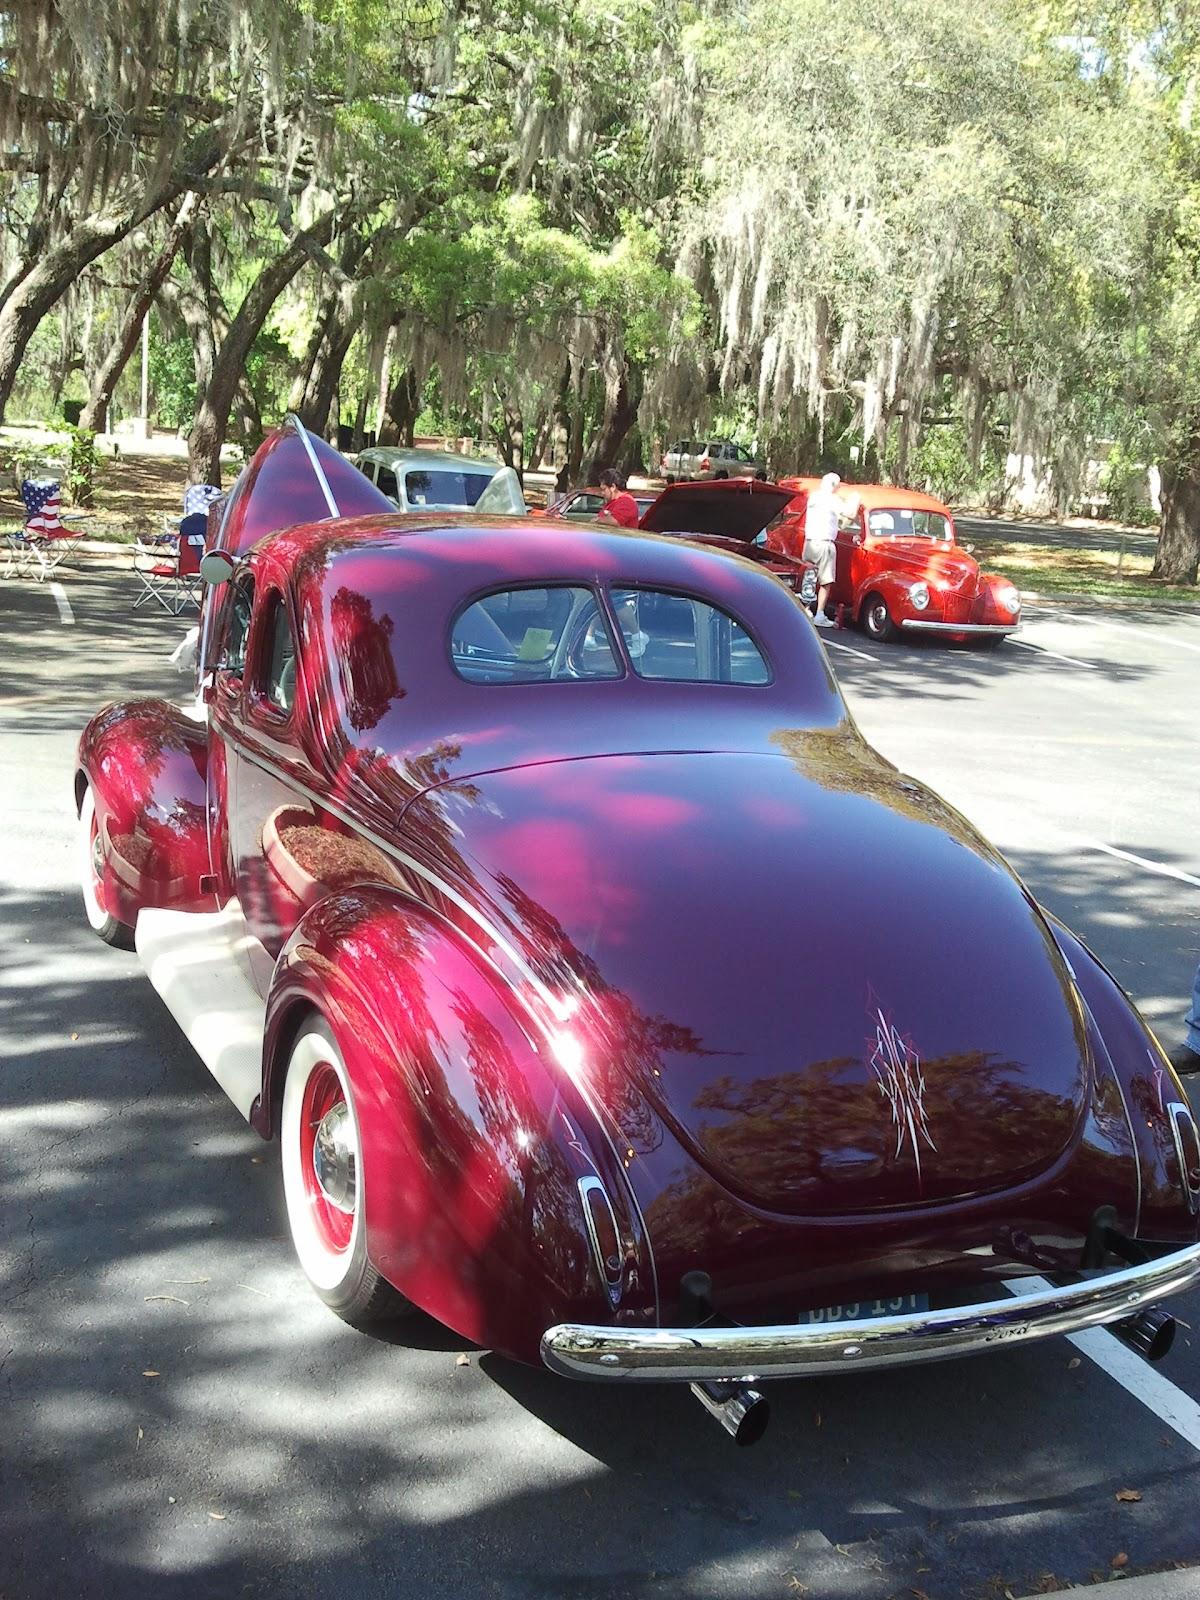 Easter+Rod+Run+2012+018 16 Van Horne St, Tybee Island, GA